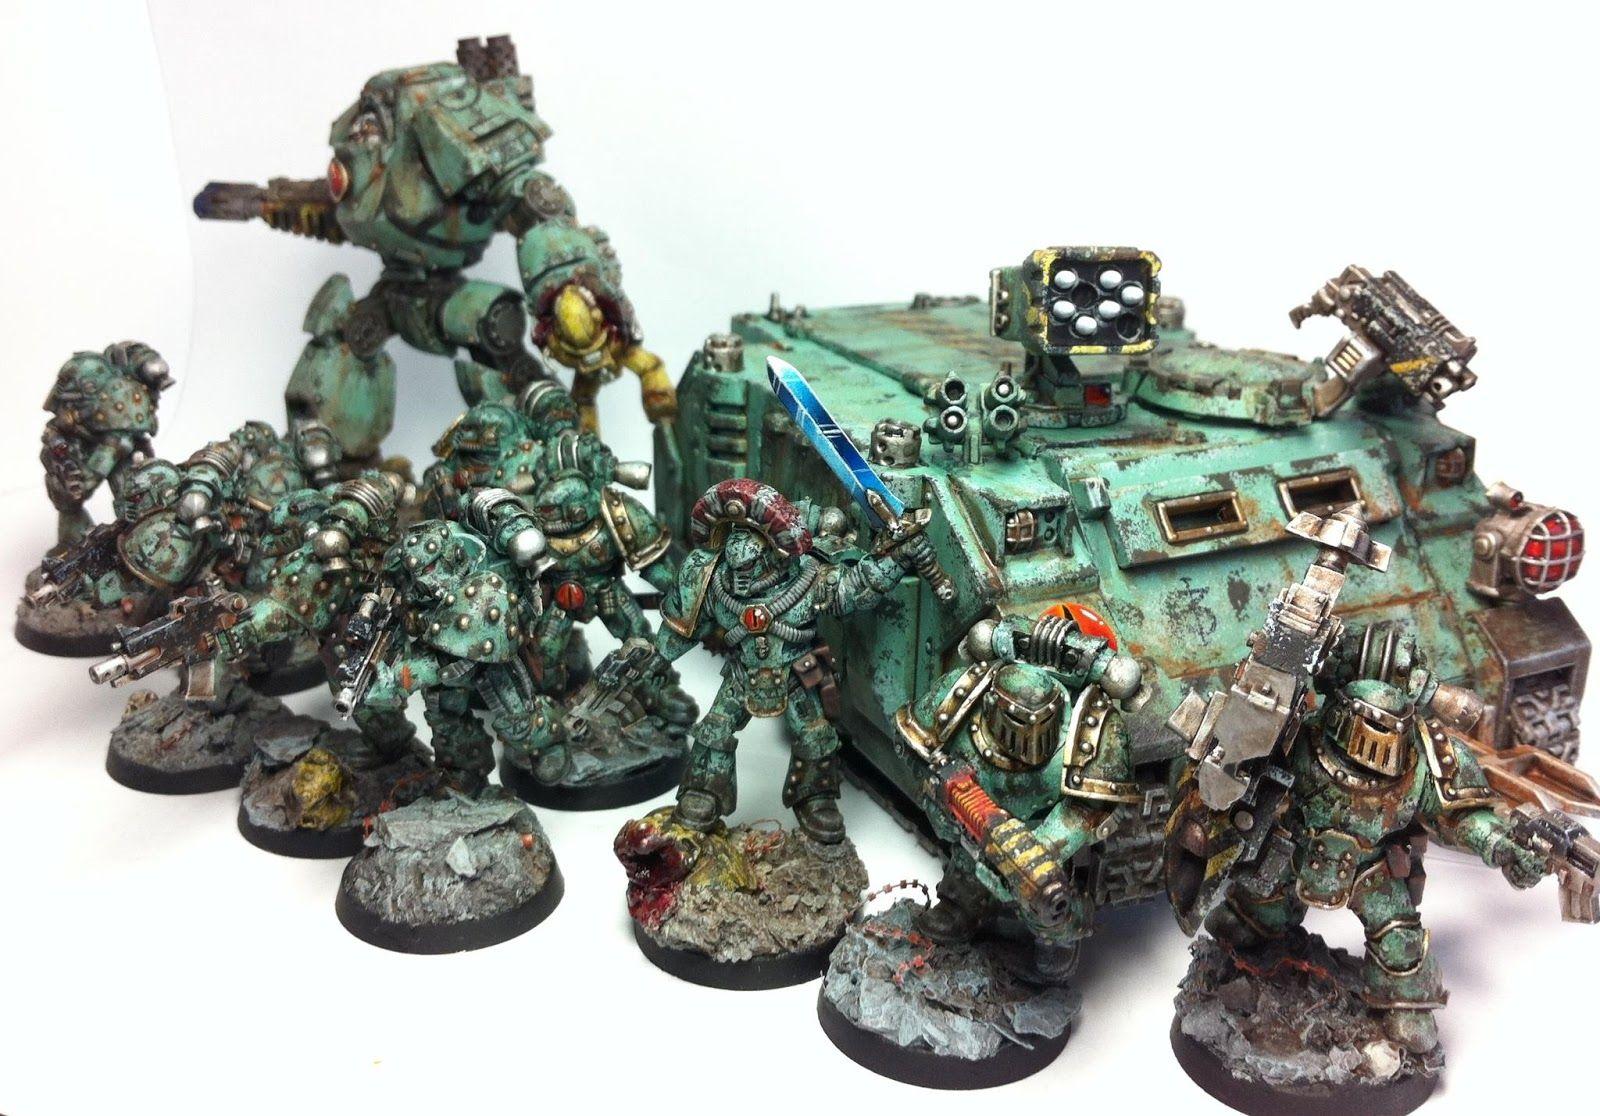 Terminus Est: Sons of Horus battle squad (by Sheep)